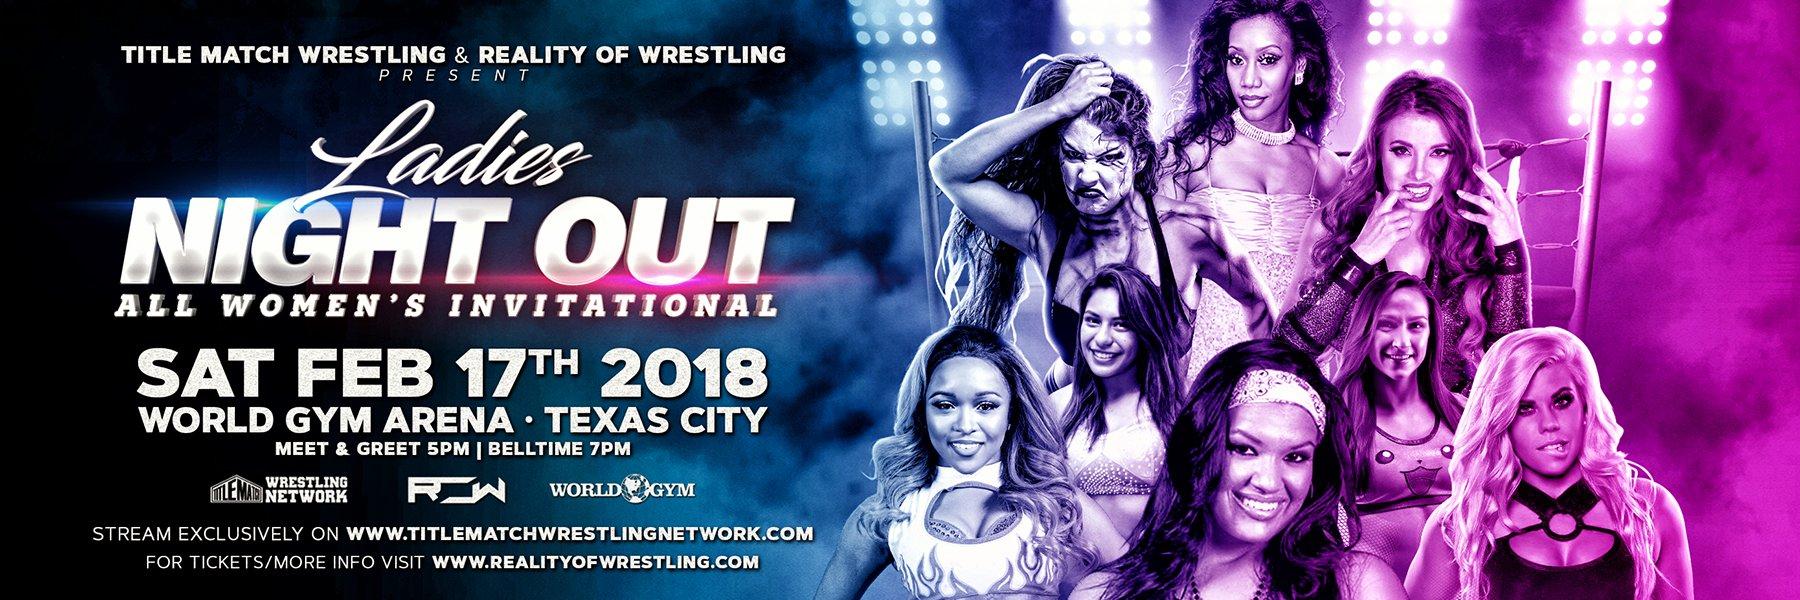 Ladies Night Out: All Women's Invitational LIVE (Su Yung vs Kiera Hogan)